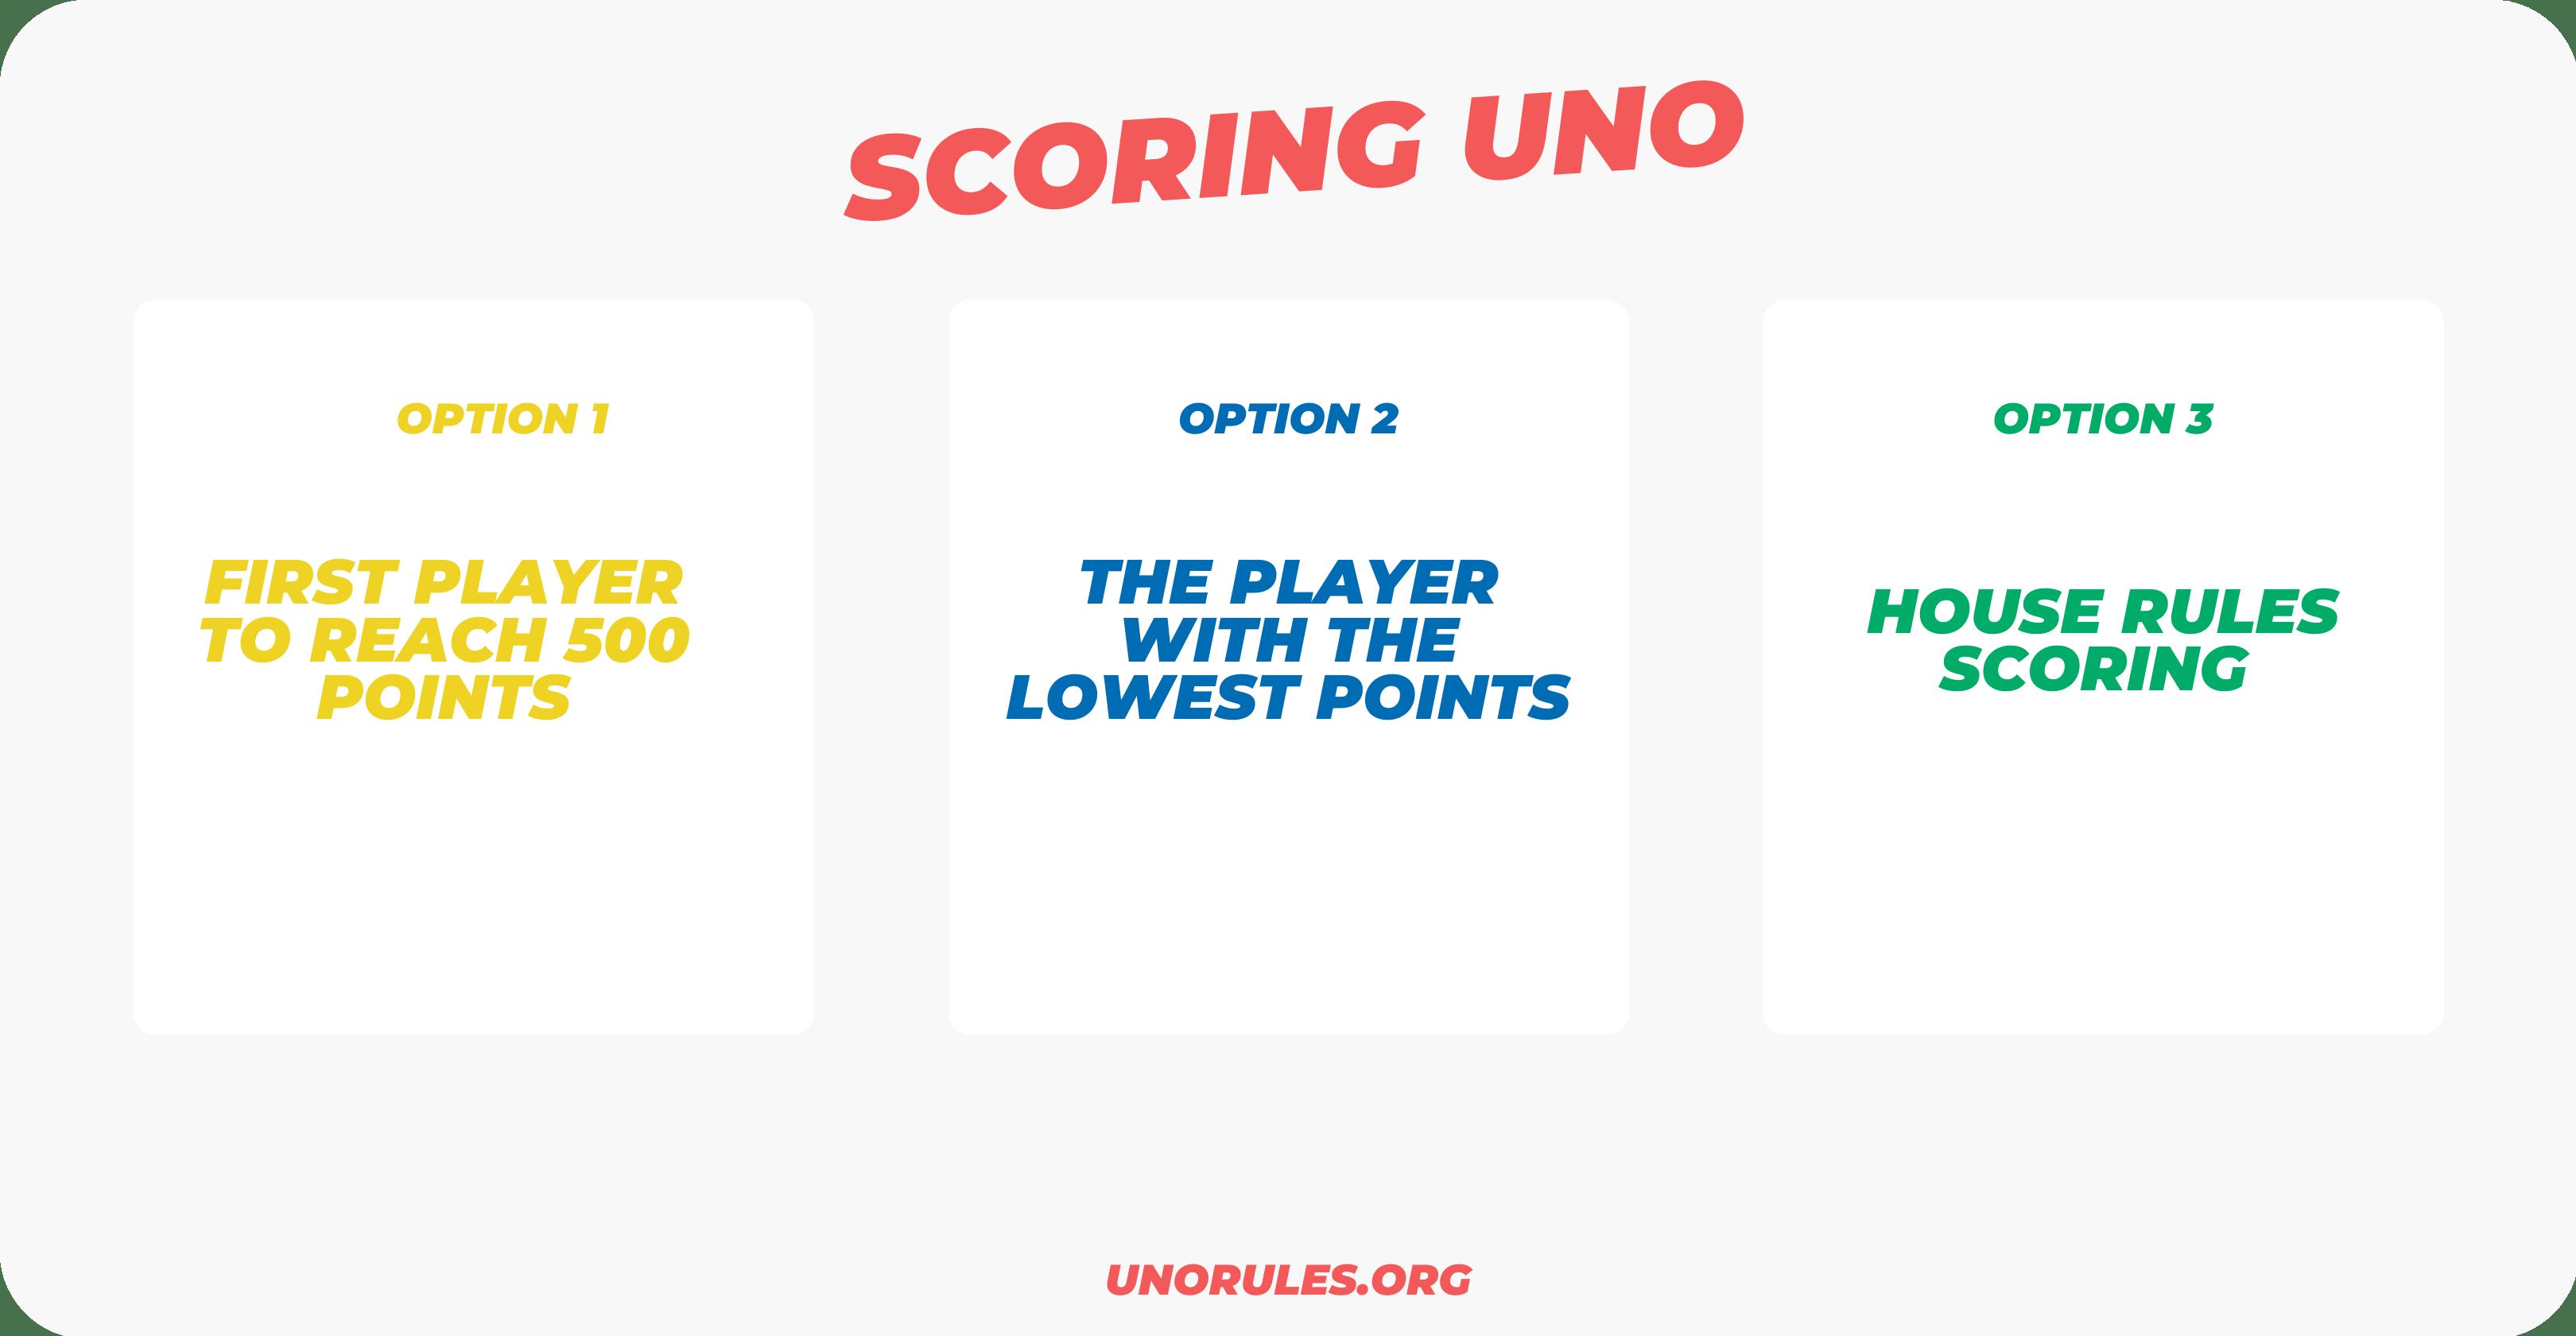 Uno scoring rules